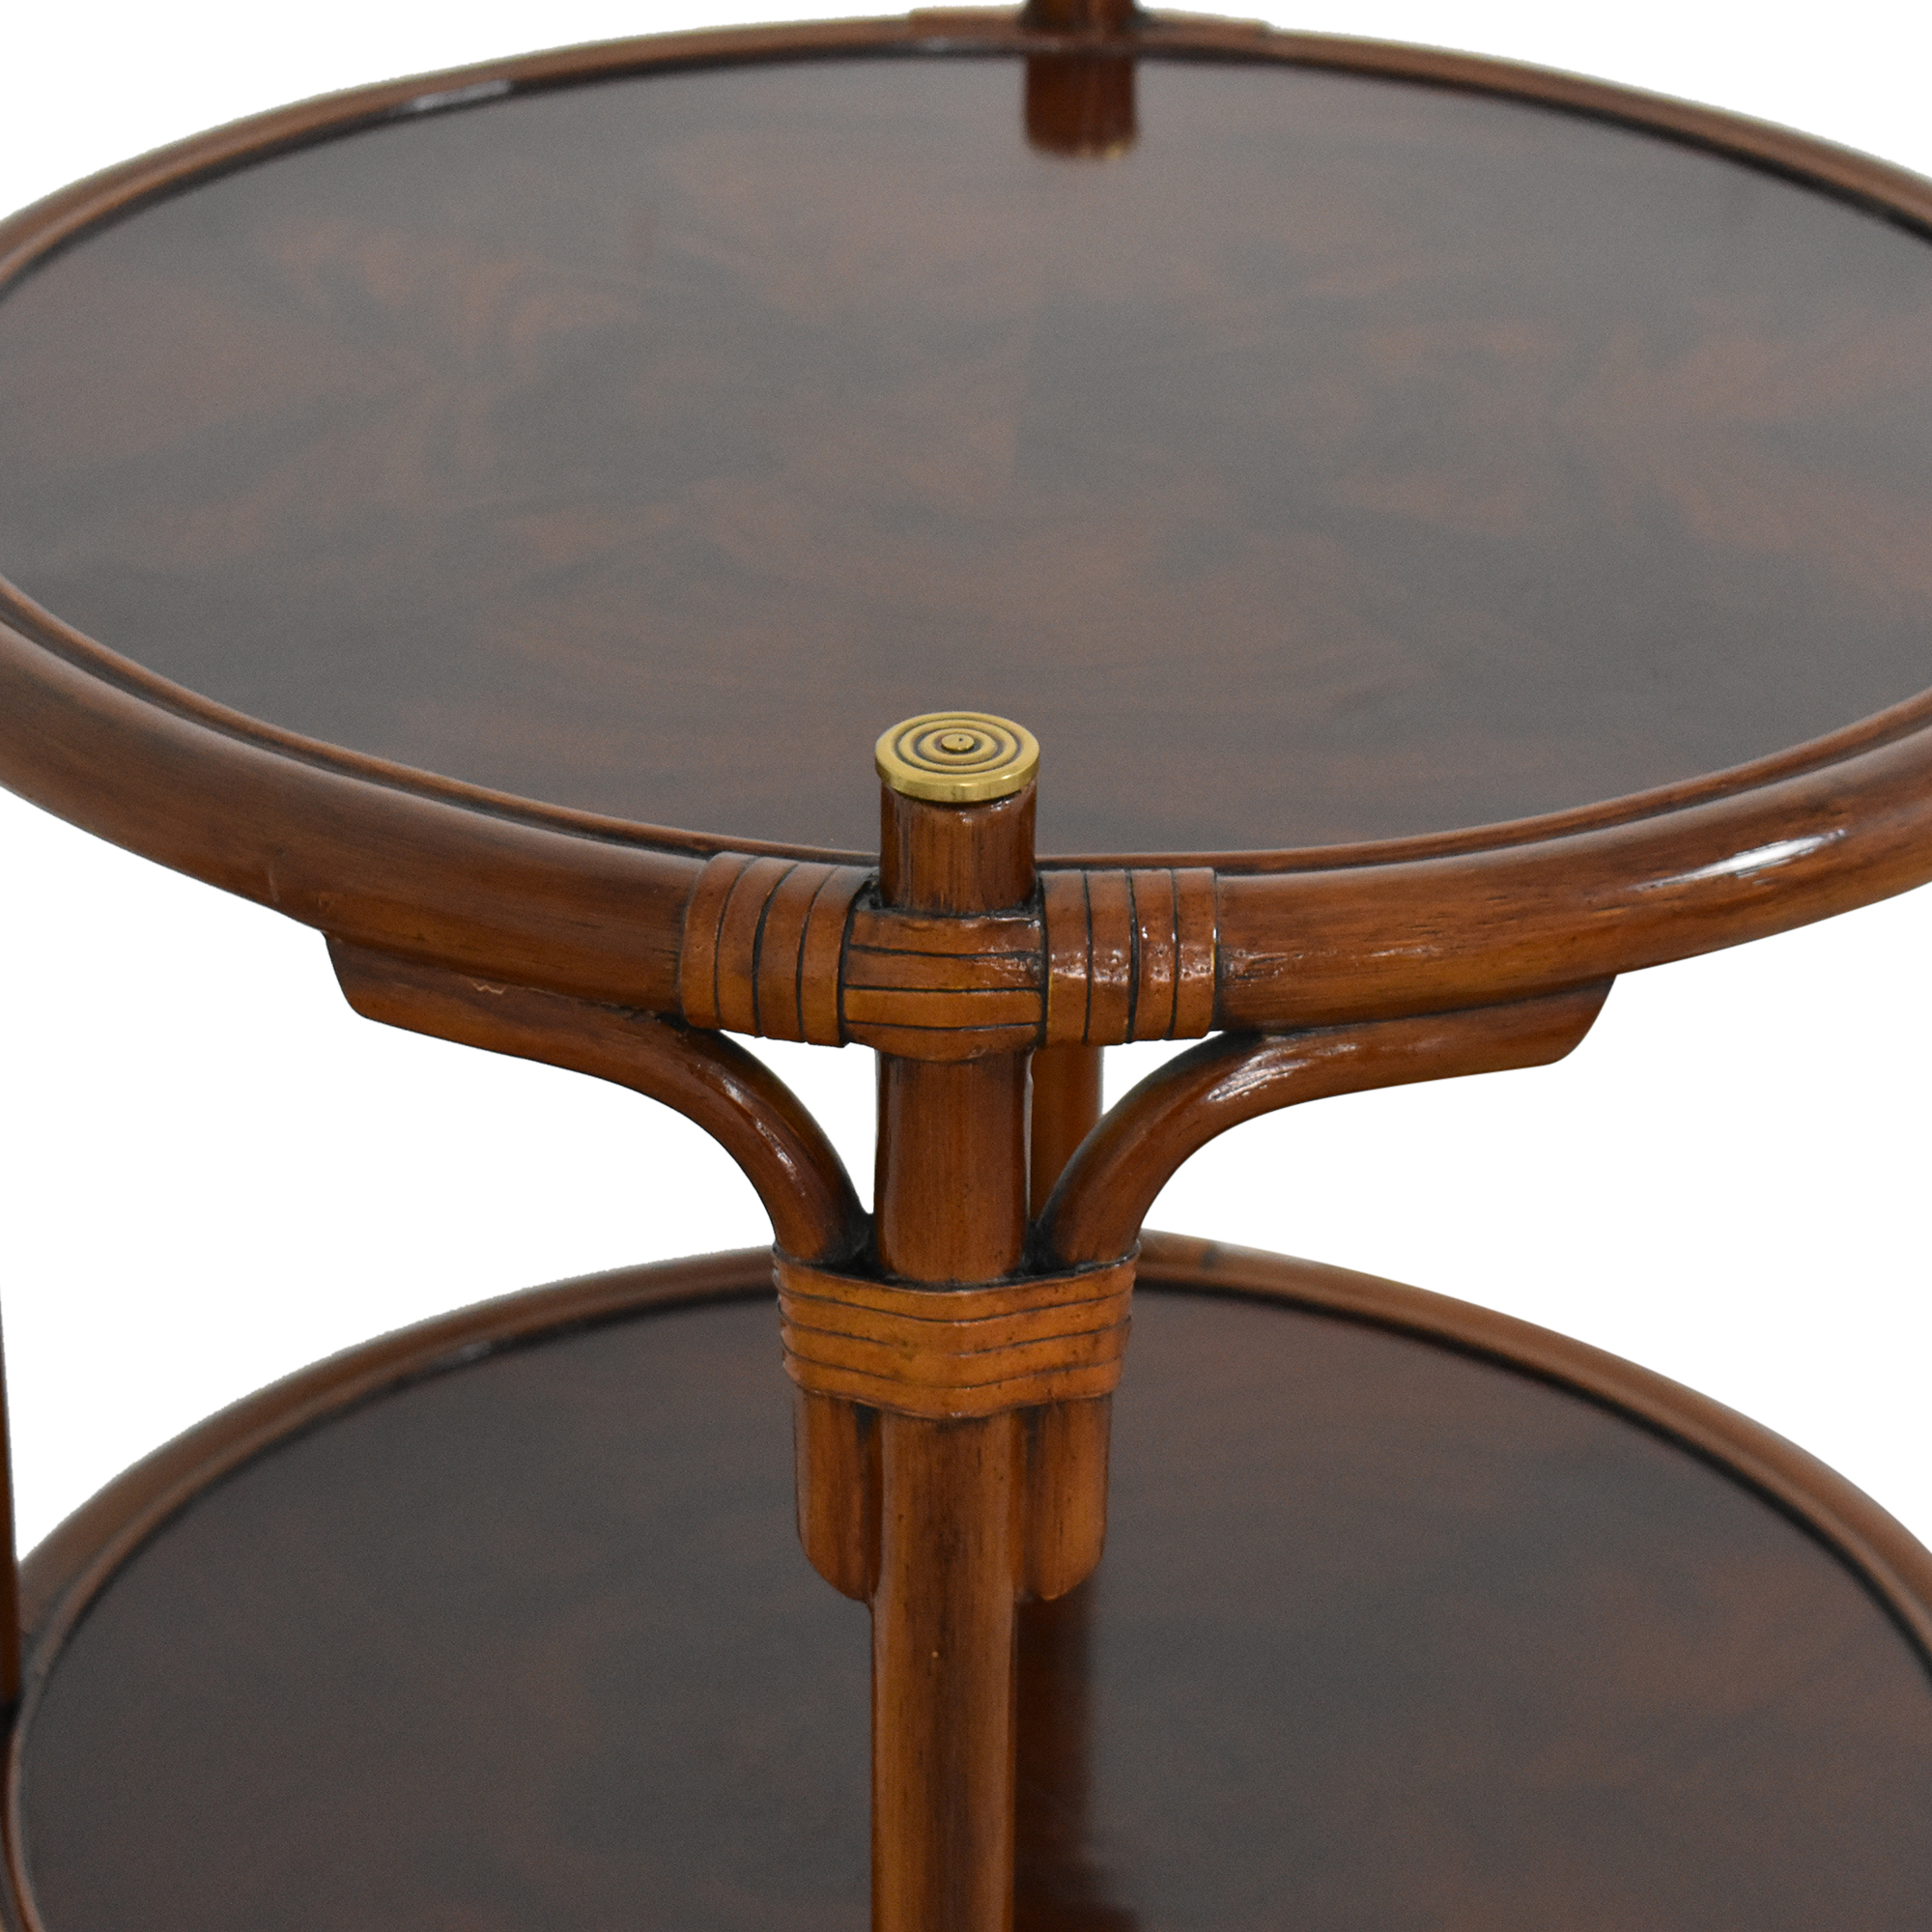 Maitland-Smith Maitland-Smith Three Tier Side Table for sale